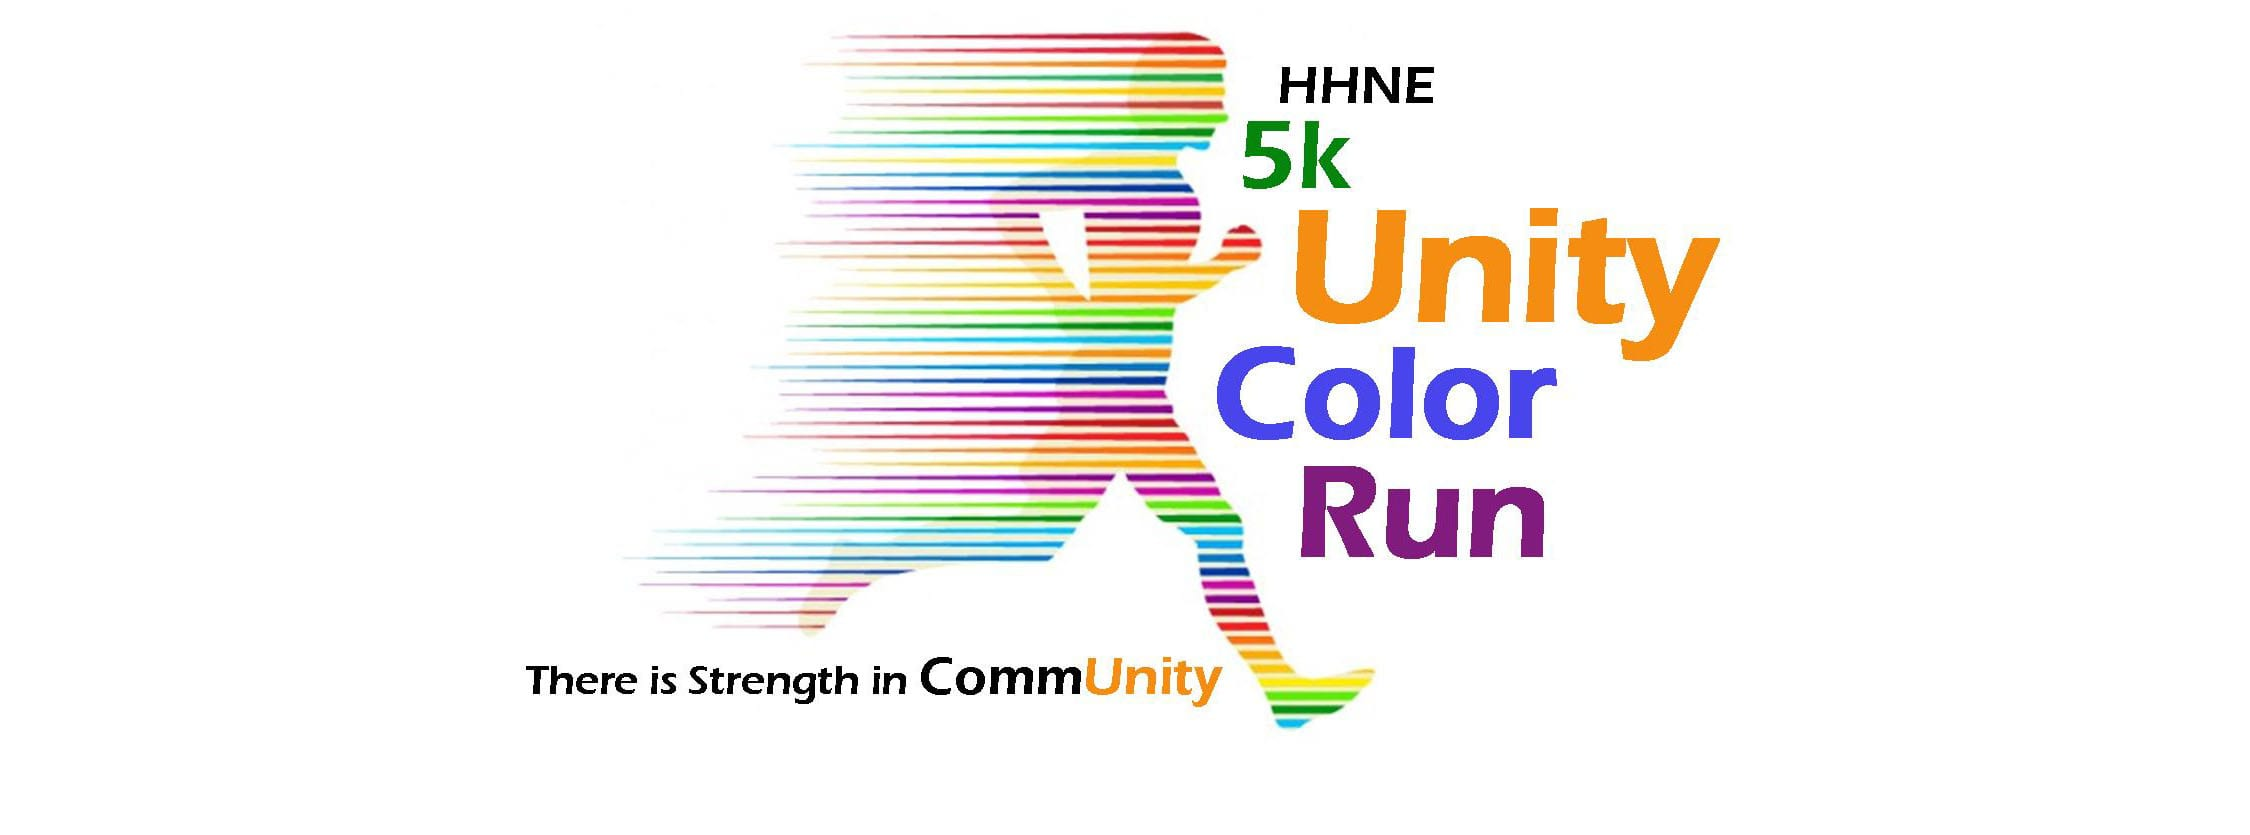 Community Invited to Participate in HHNE's Inaugural Unity